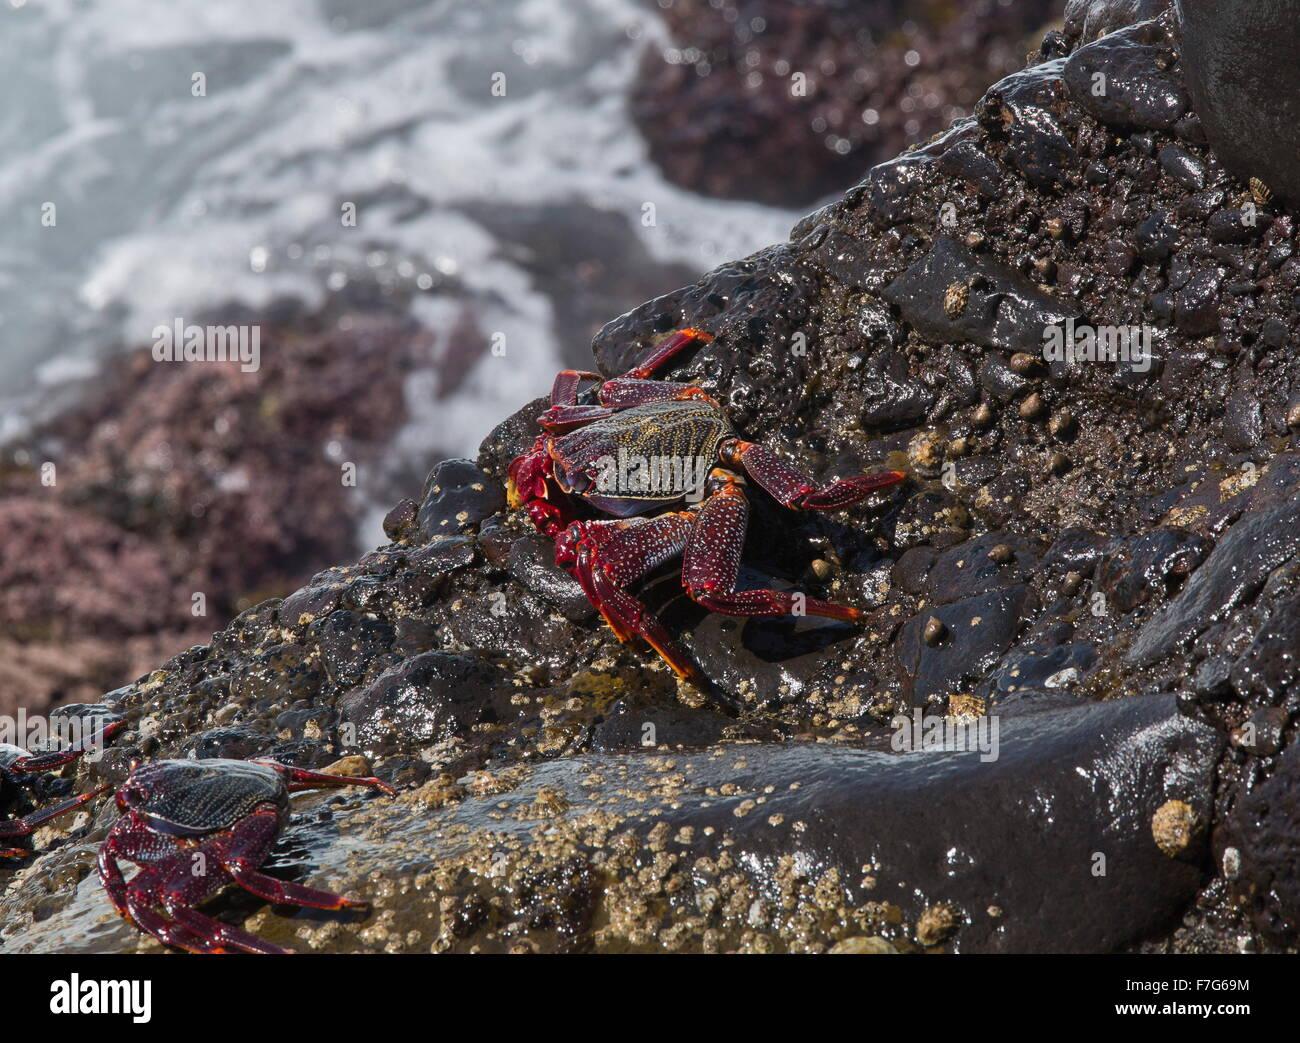 Atlantic Rock Crab, Grapsus adscensionis, on the edge of the ocean, West coast of Lanzarote. Stock Photo